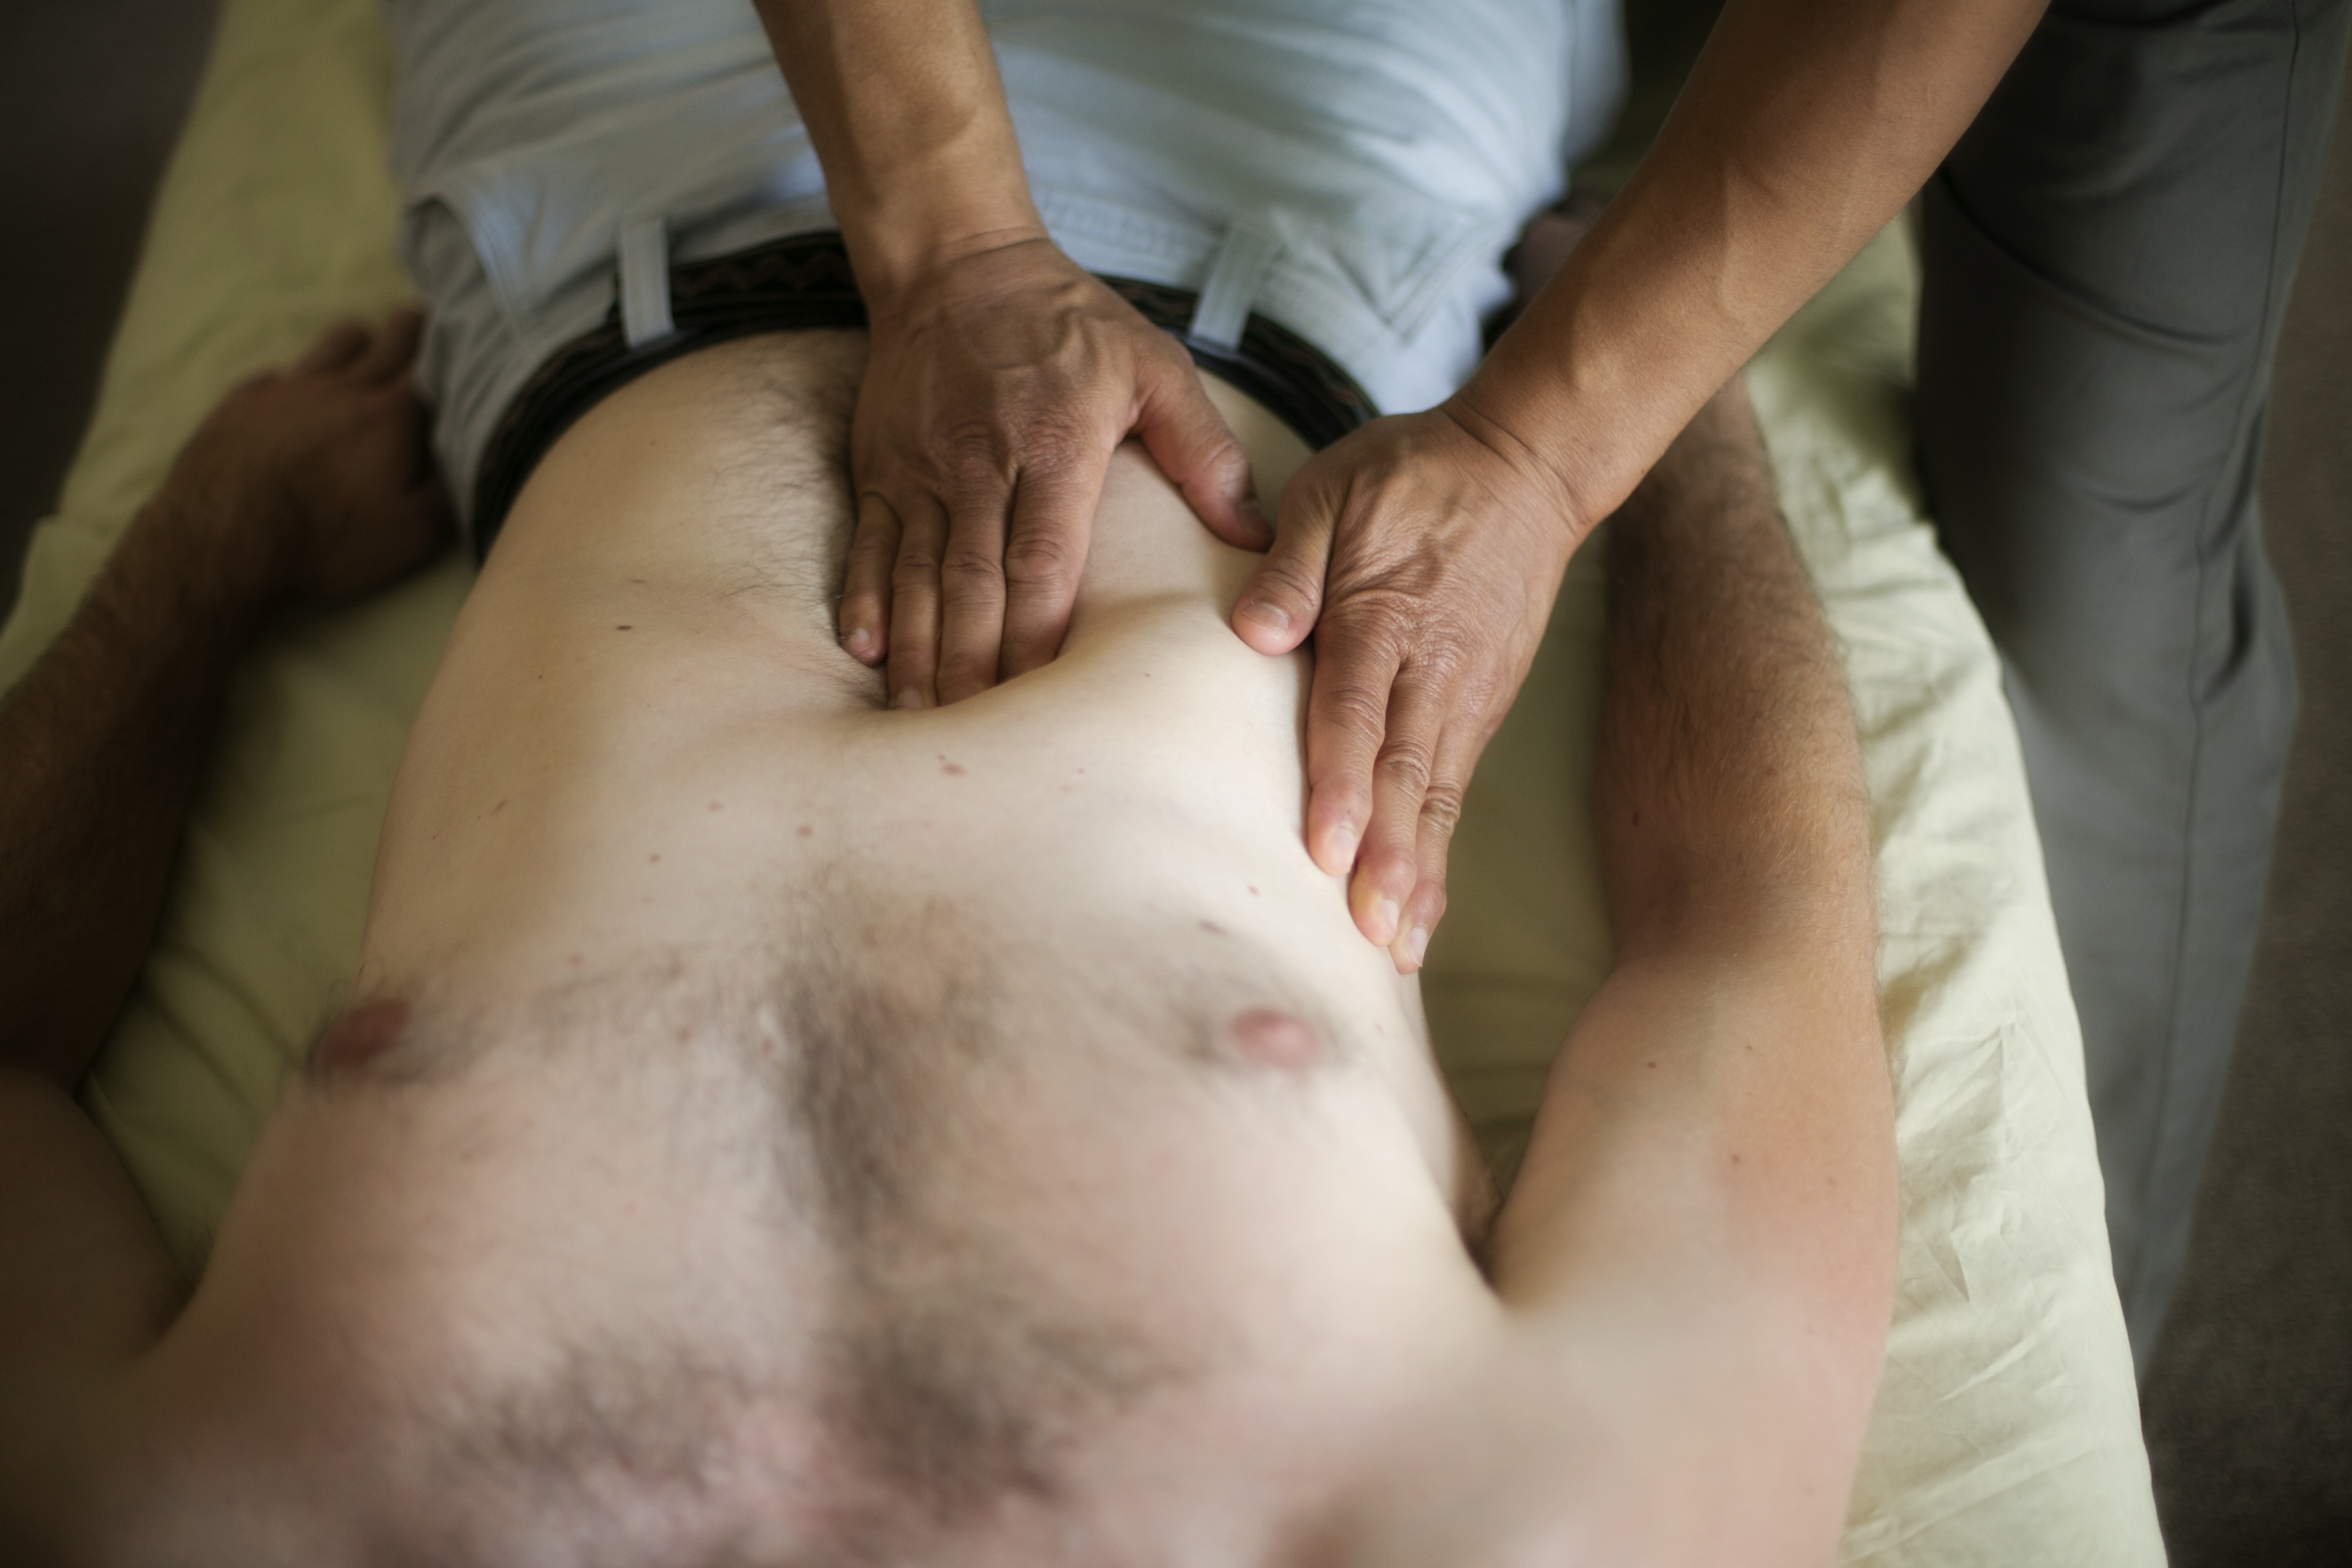 Massage therapist in Dublin, California, Massage, deep tissue, sportsÊmassage, labrum tear, lordosis, neuro-muscular, hip pain, shoulder pain, ROLF